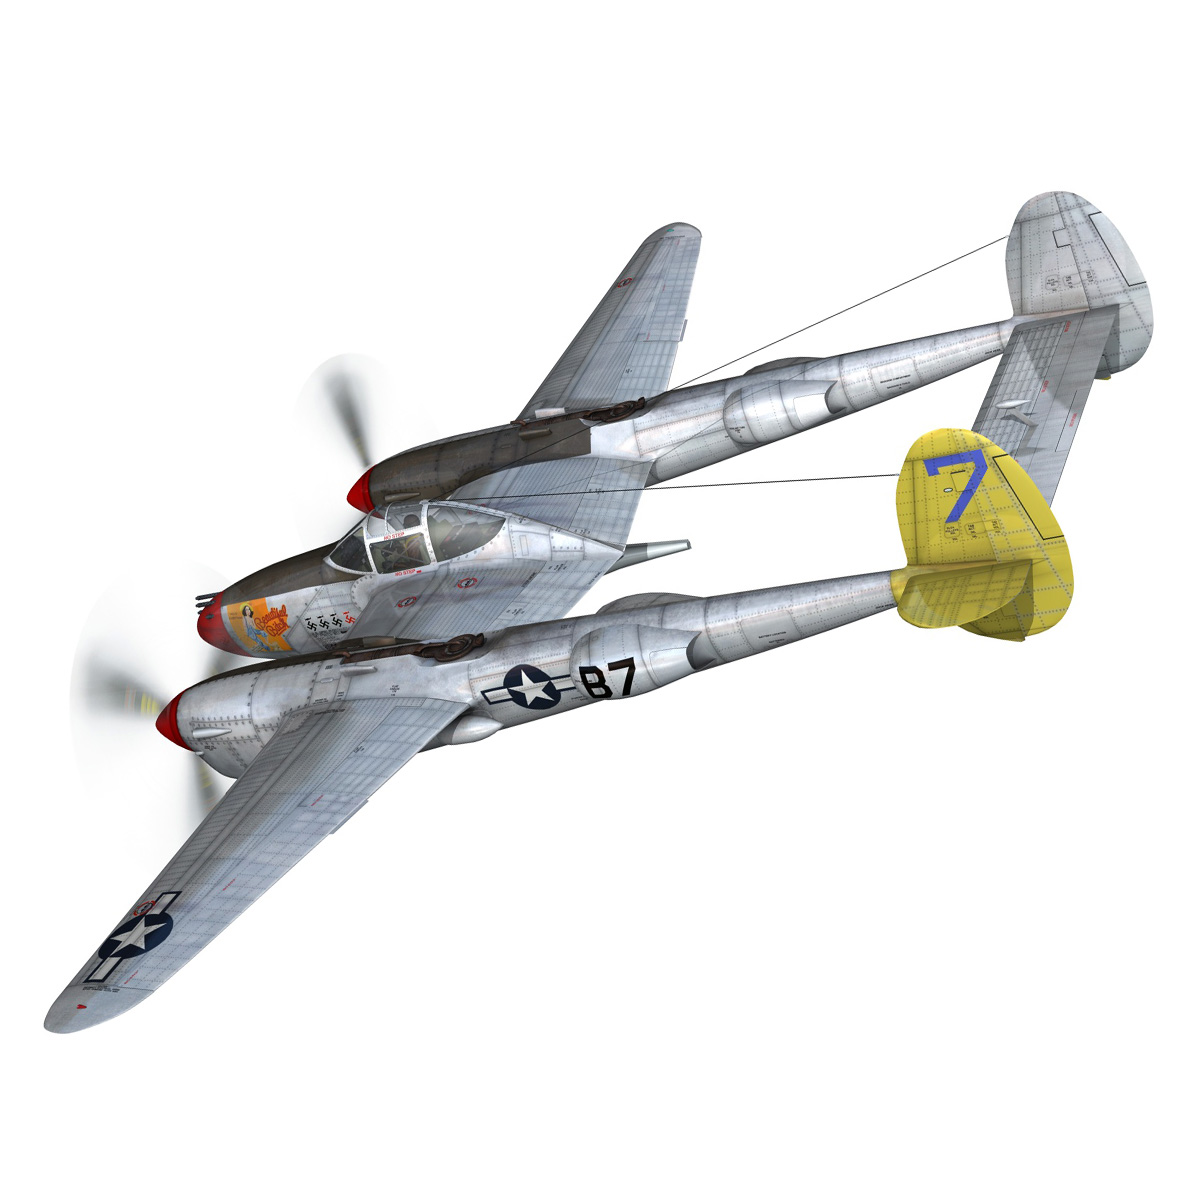 lockheed p-38 lightning – beautiful bitch 3d model fbx c4d lwo obj 272667